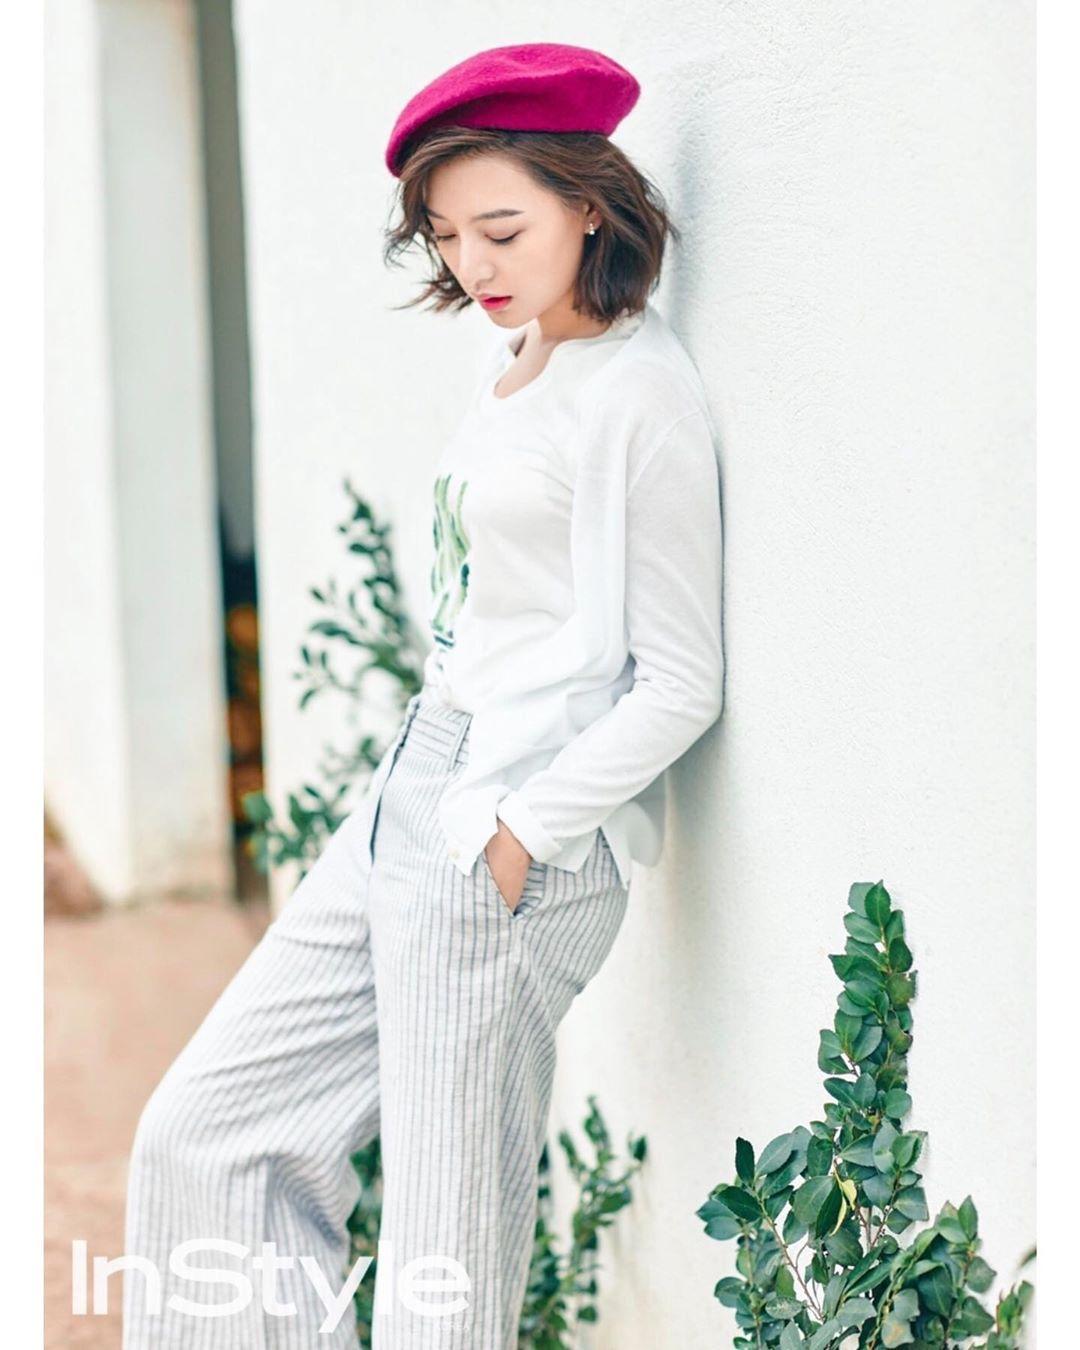 34 best images about Korean Star - Kim Ji Won on Pinterest